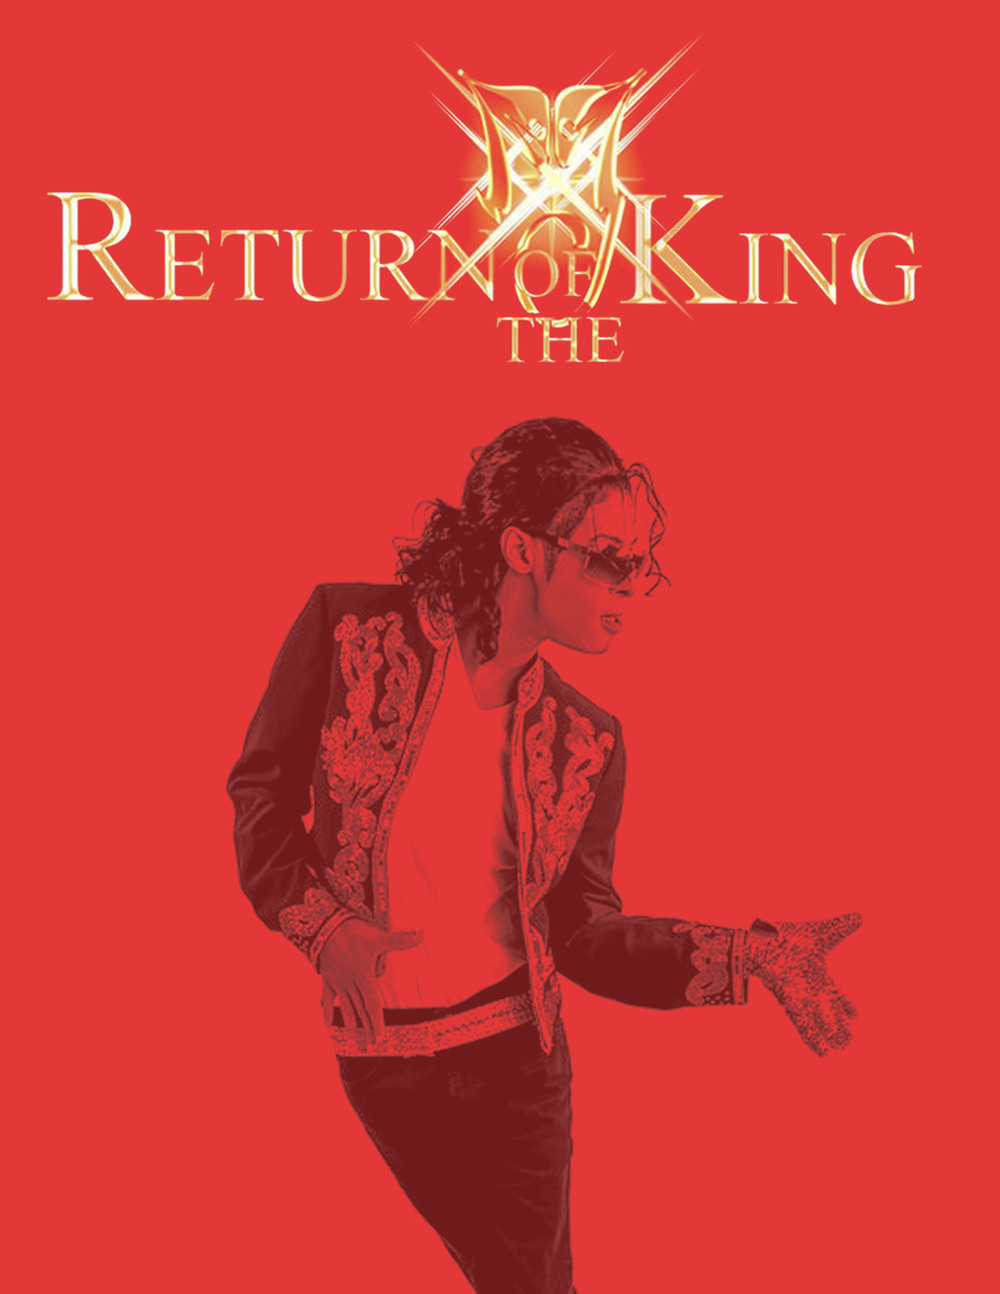 Returnoftheking1_copy_copy